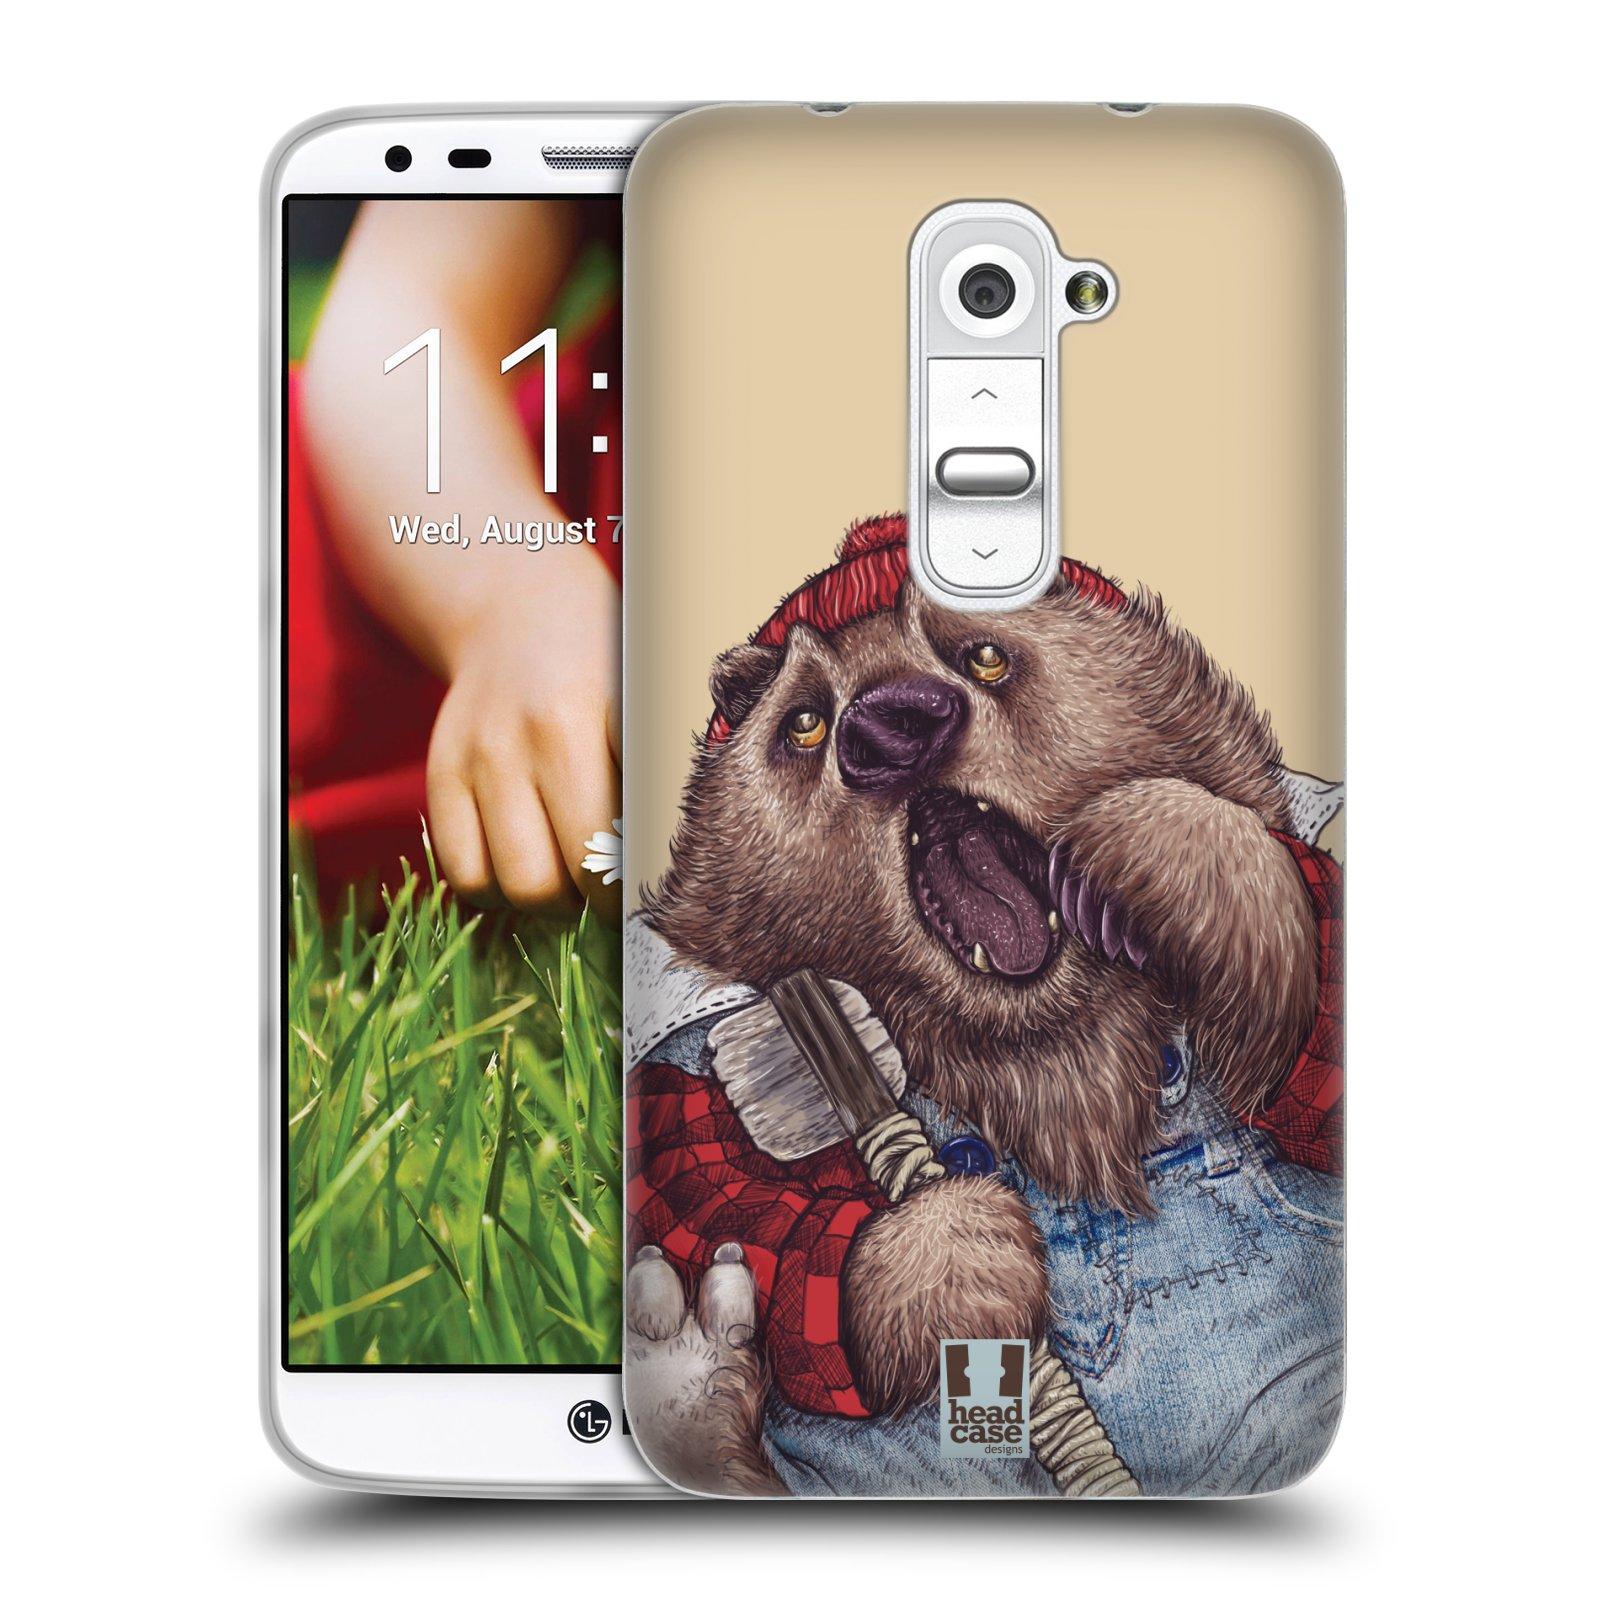 HEAD CASE silikonový obal na mobil LG G2 vzor Kreslená zvířátka medvěd